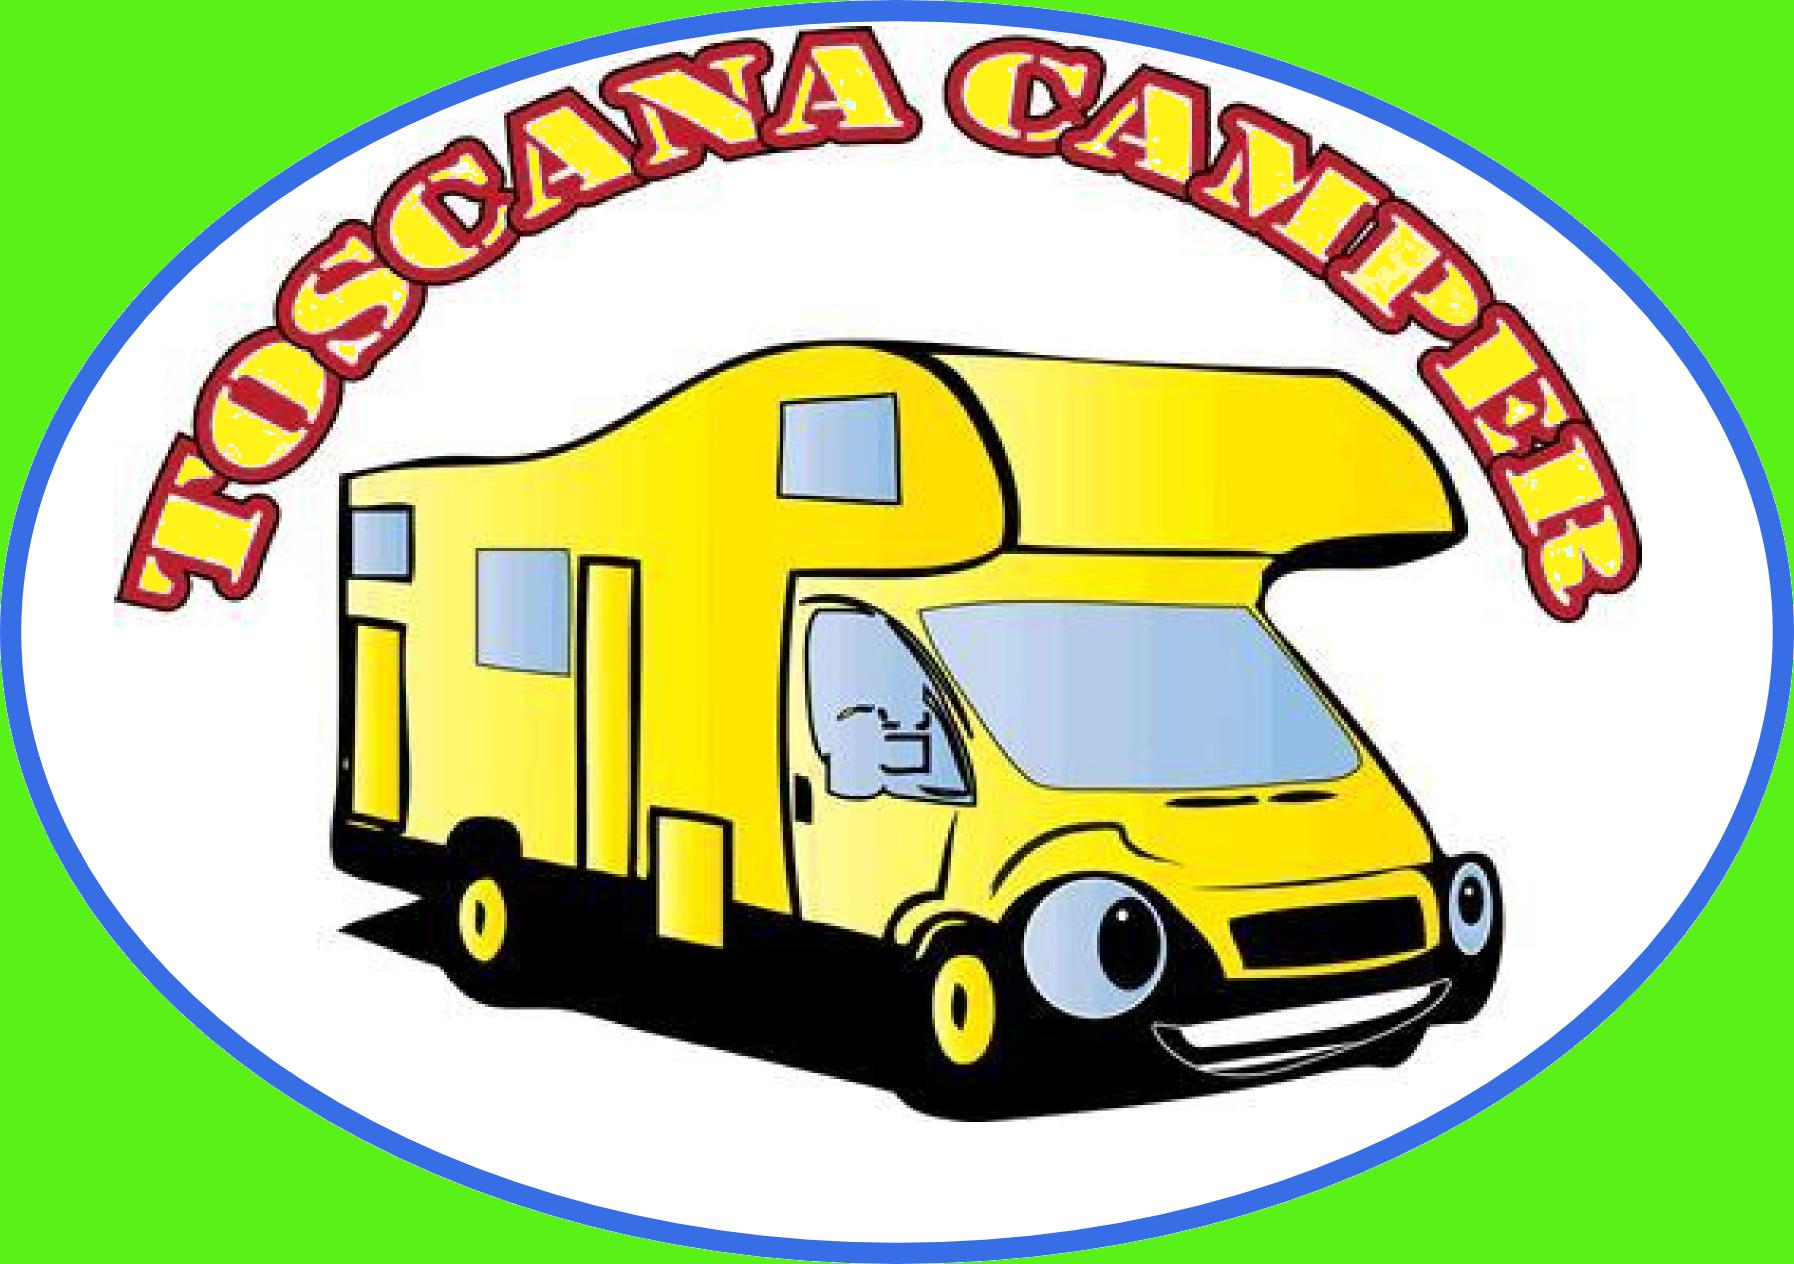 Toscana Camper